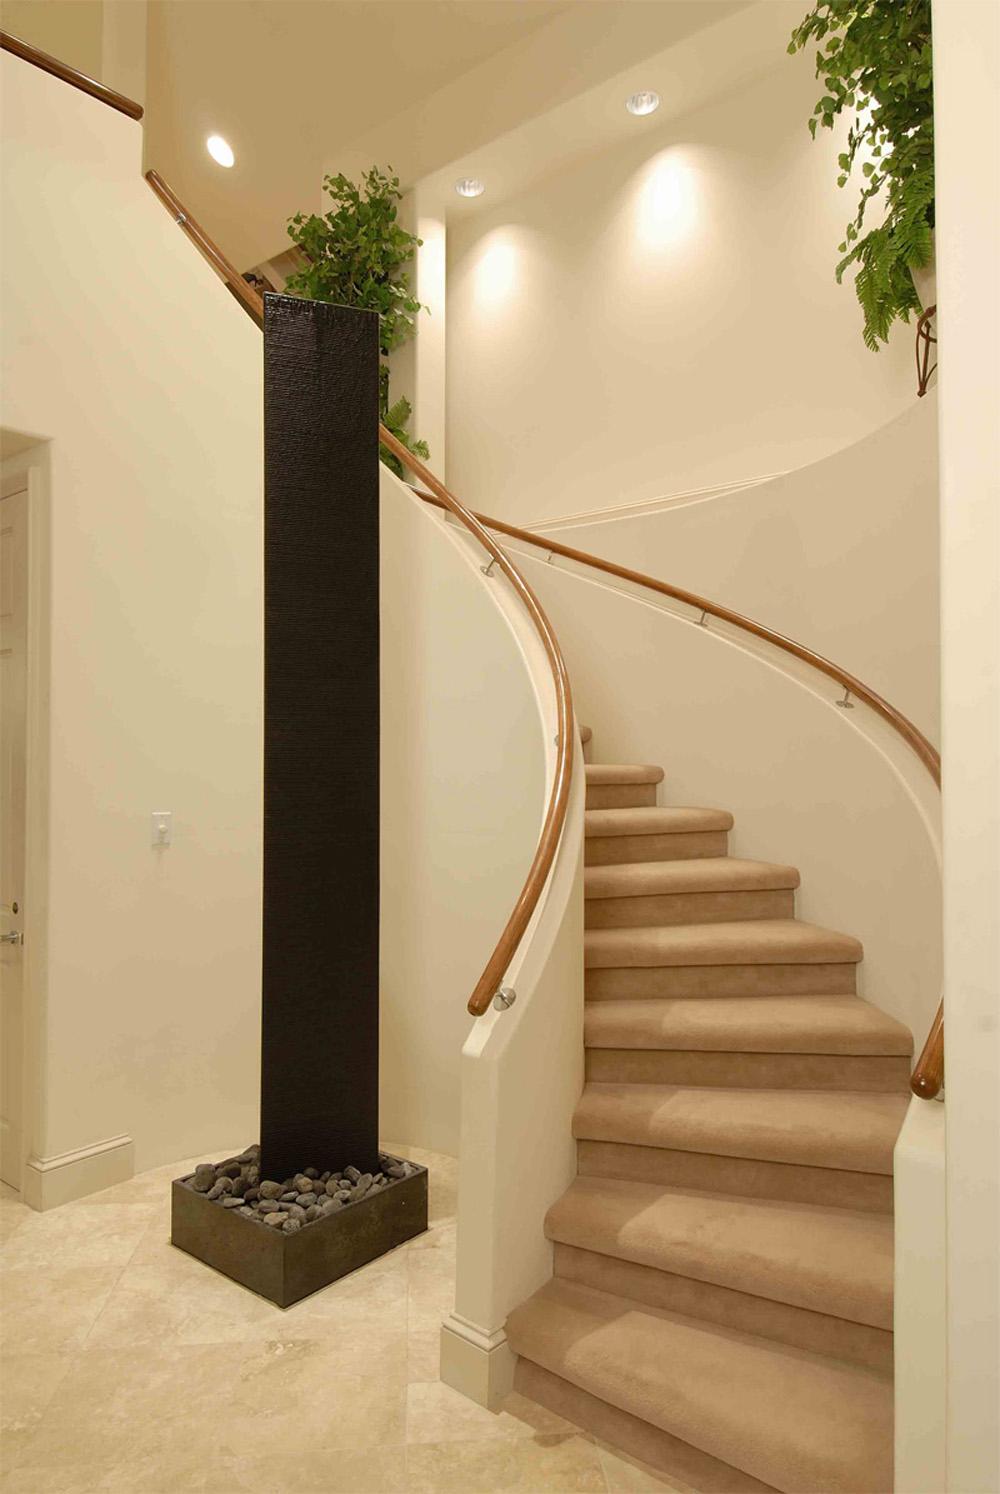 Simple Home Interior Design: Interior Design And Deco